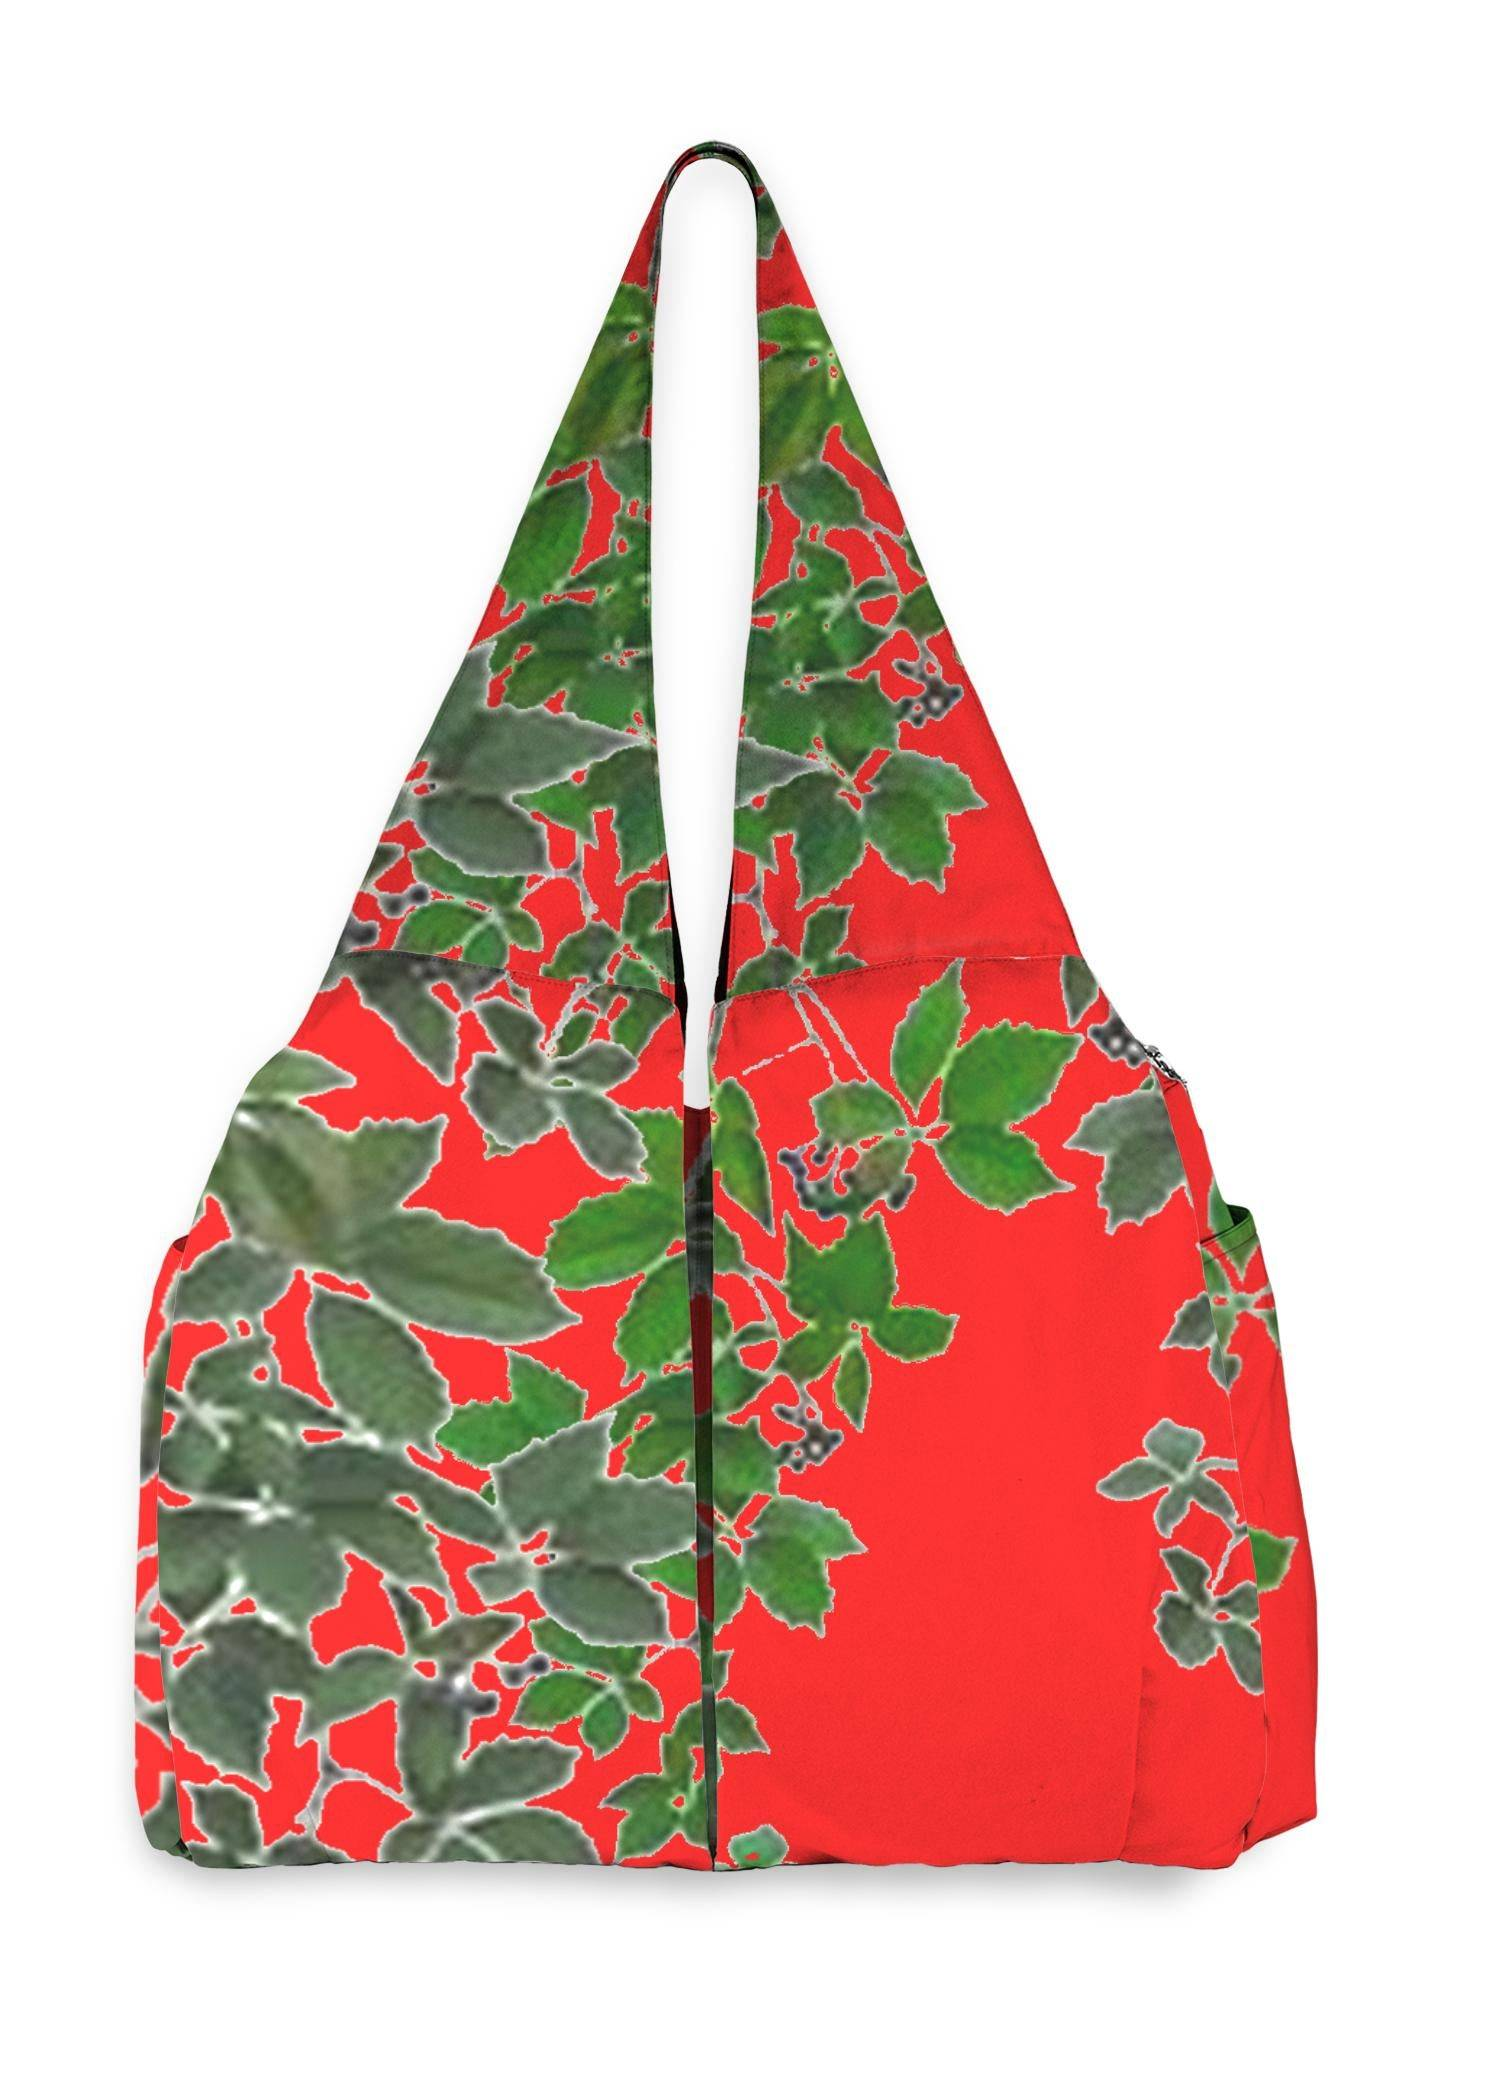 VIDA Studio Bag - Red Hanging Home Decor  2 by VIDA Original Artist  - Size: One Size